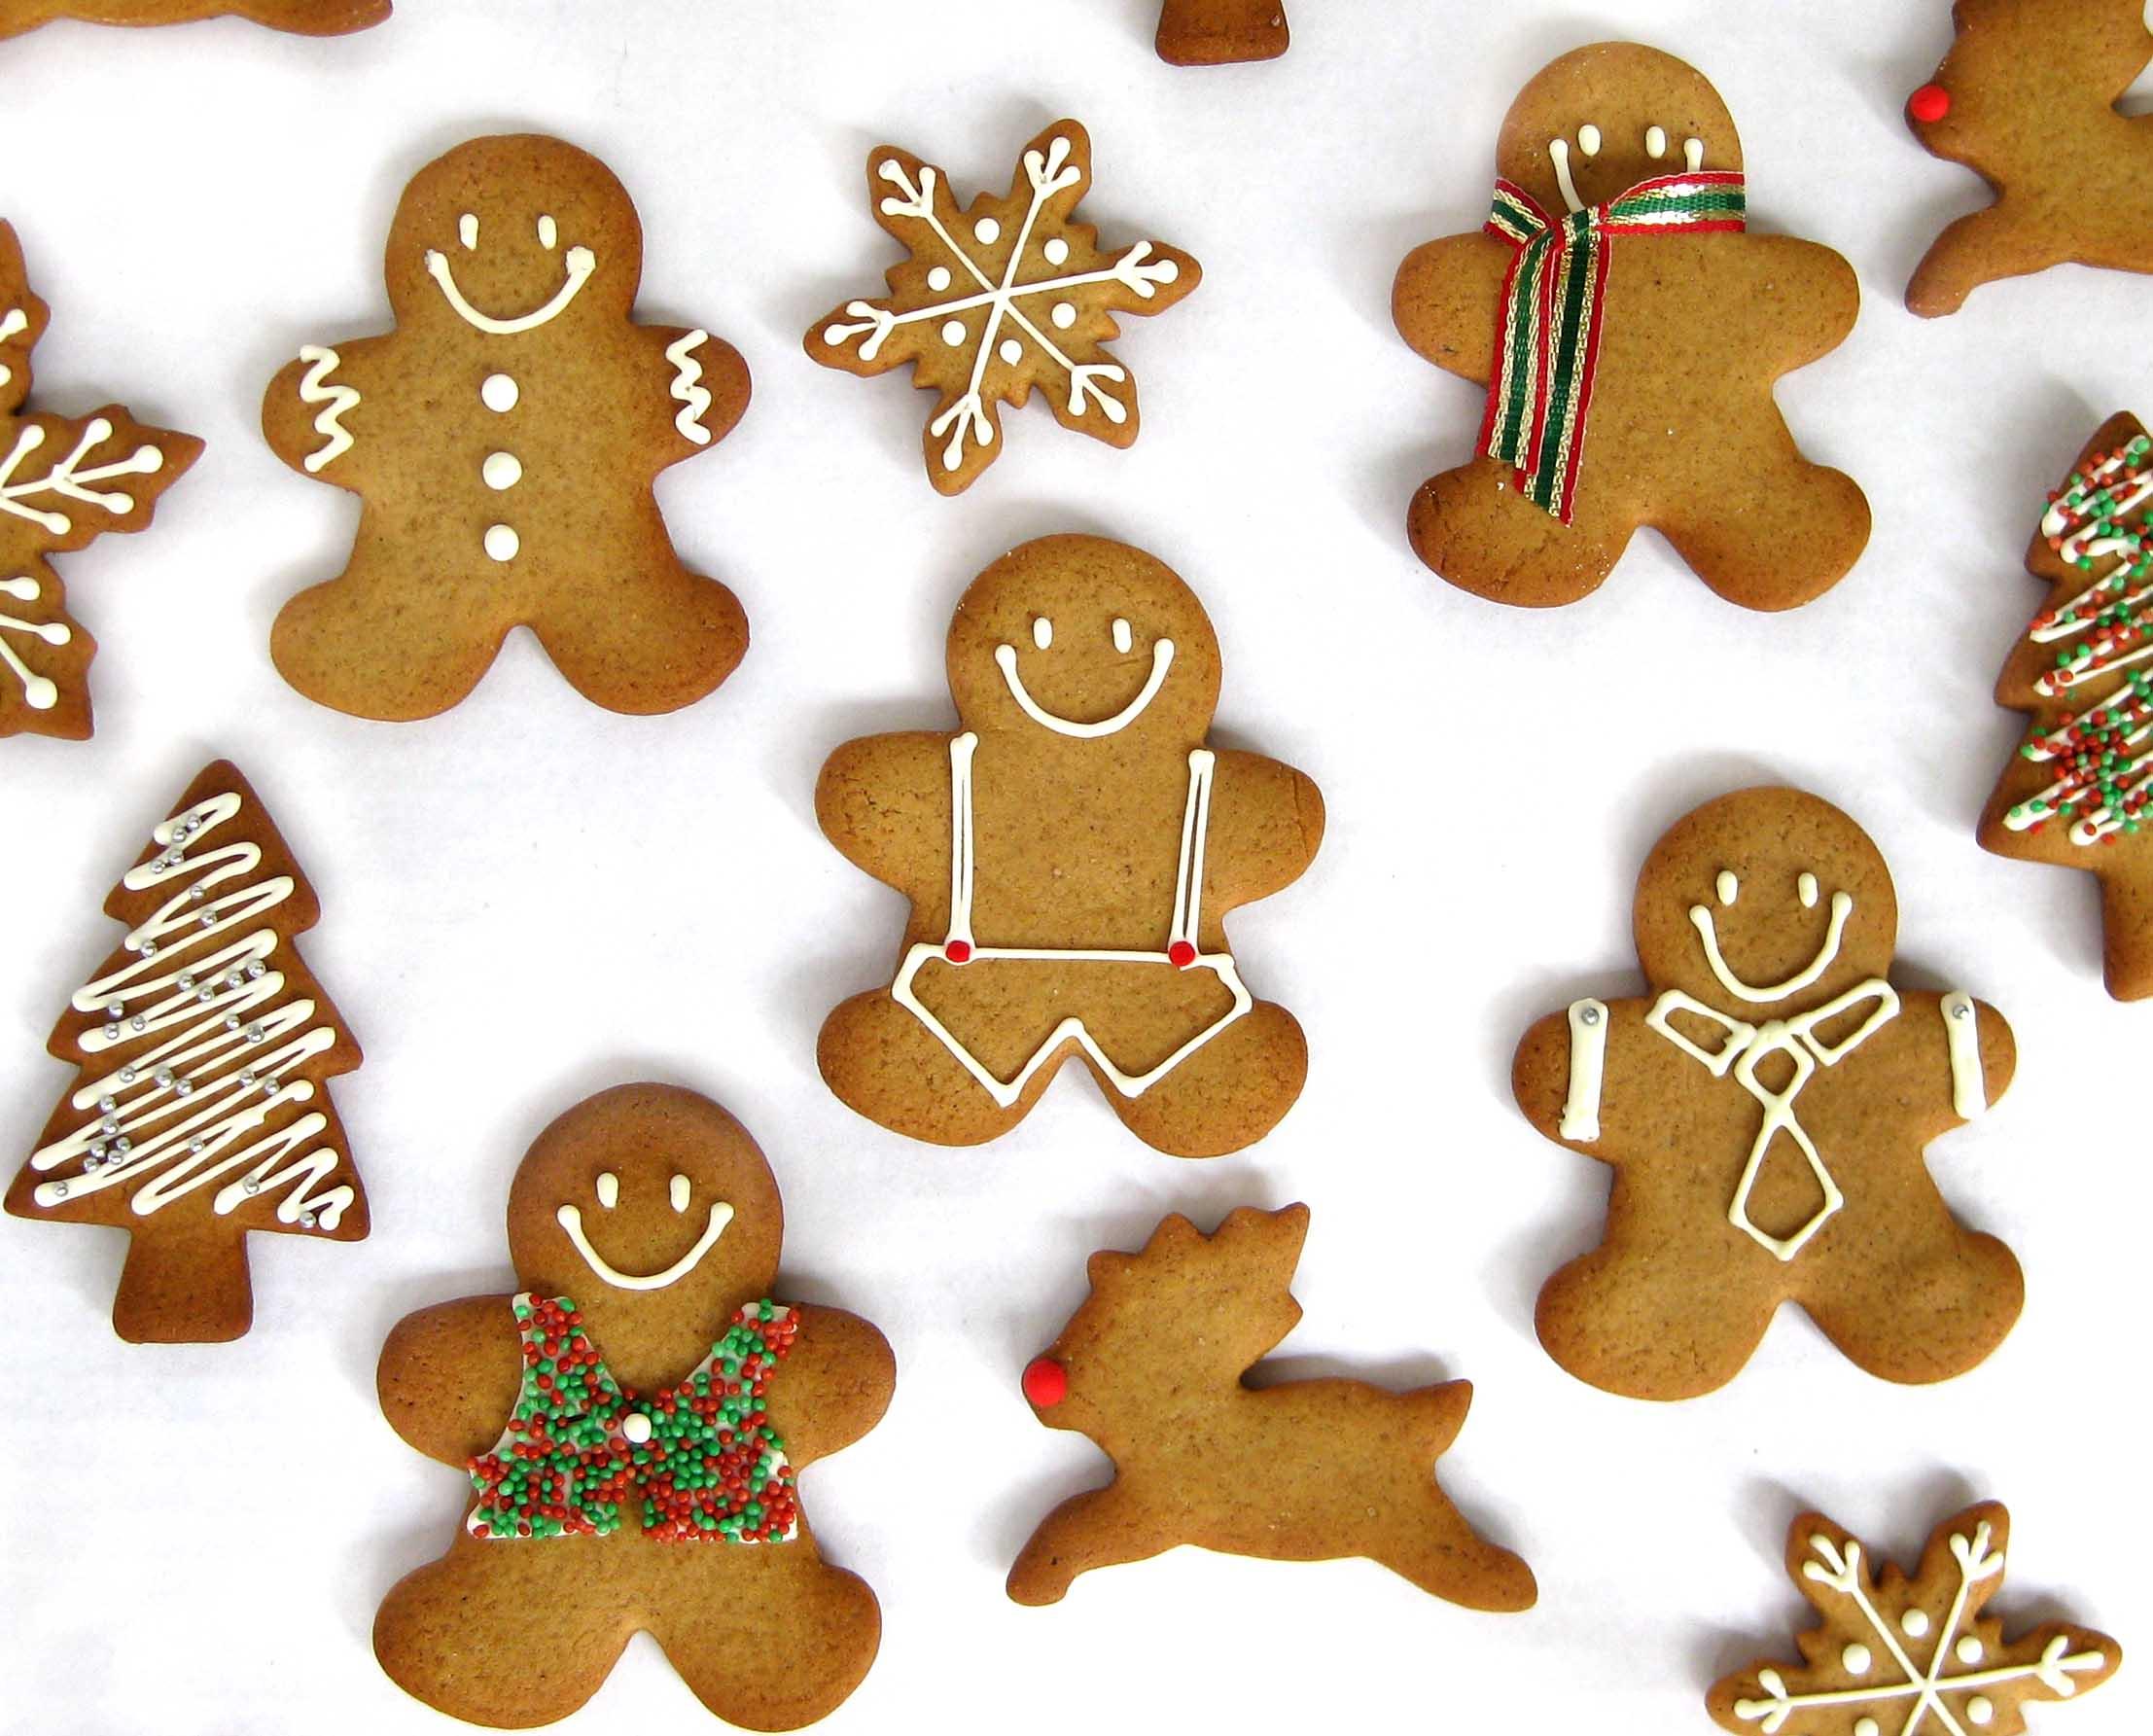 Ho Ho Ho – It's Gingerbread Time! | The Cookie Shop